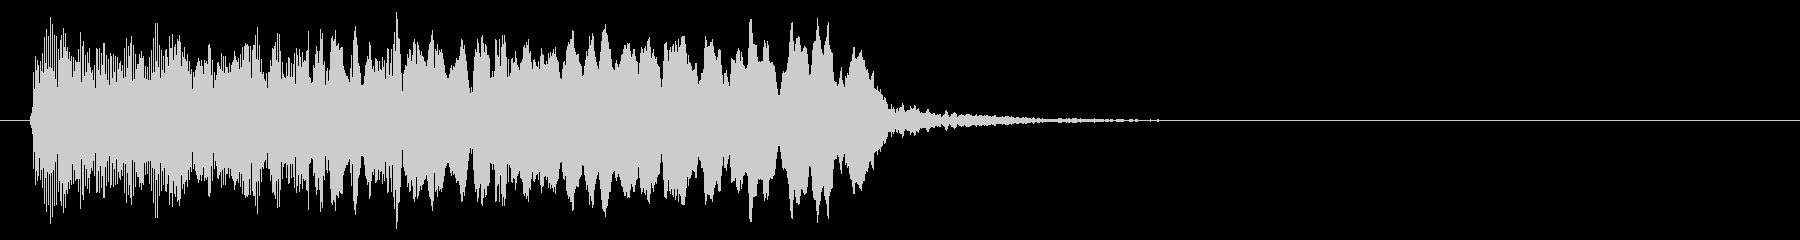 8bitパワーup-01-5_revの未再生の波形